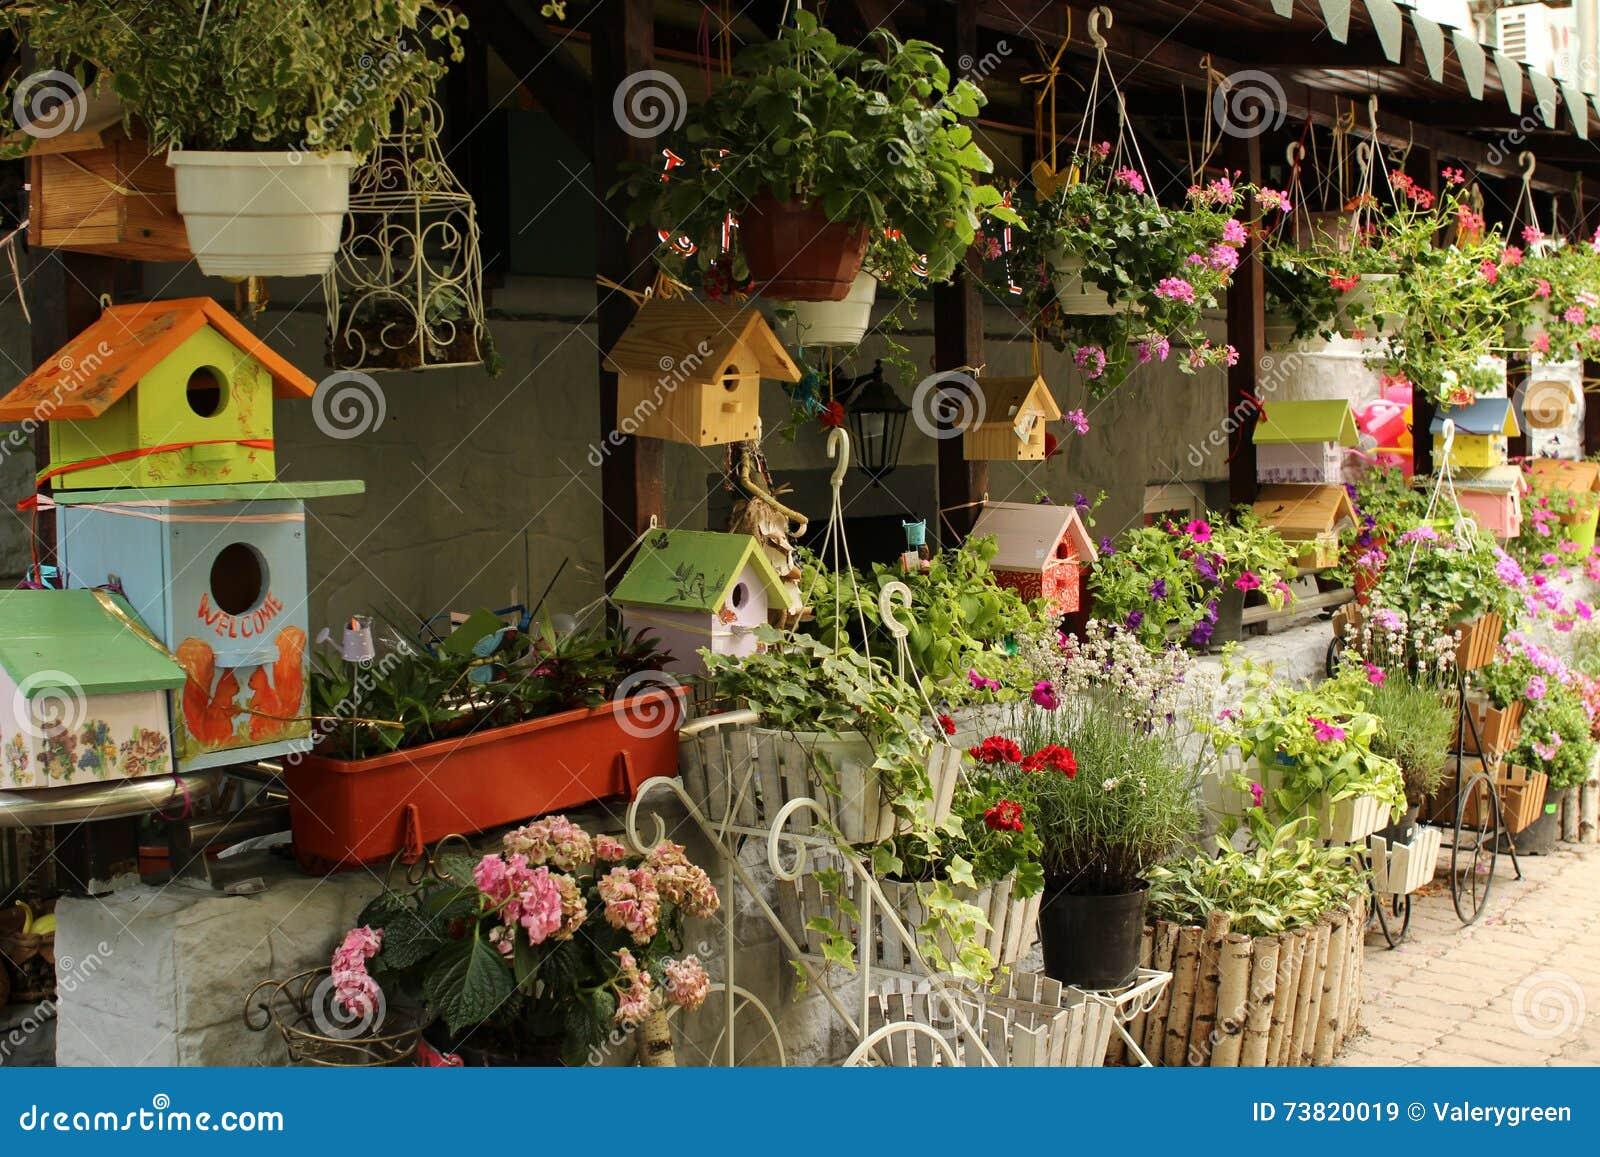 Flower Store Exterior Decoration Stock Image - Image of market ...